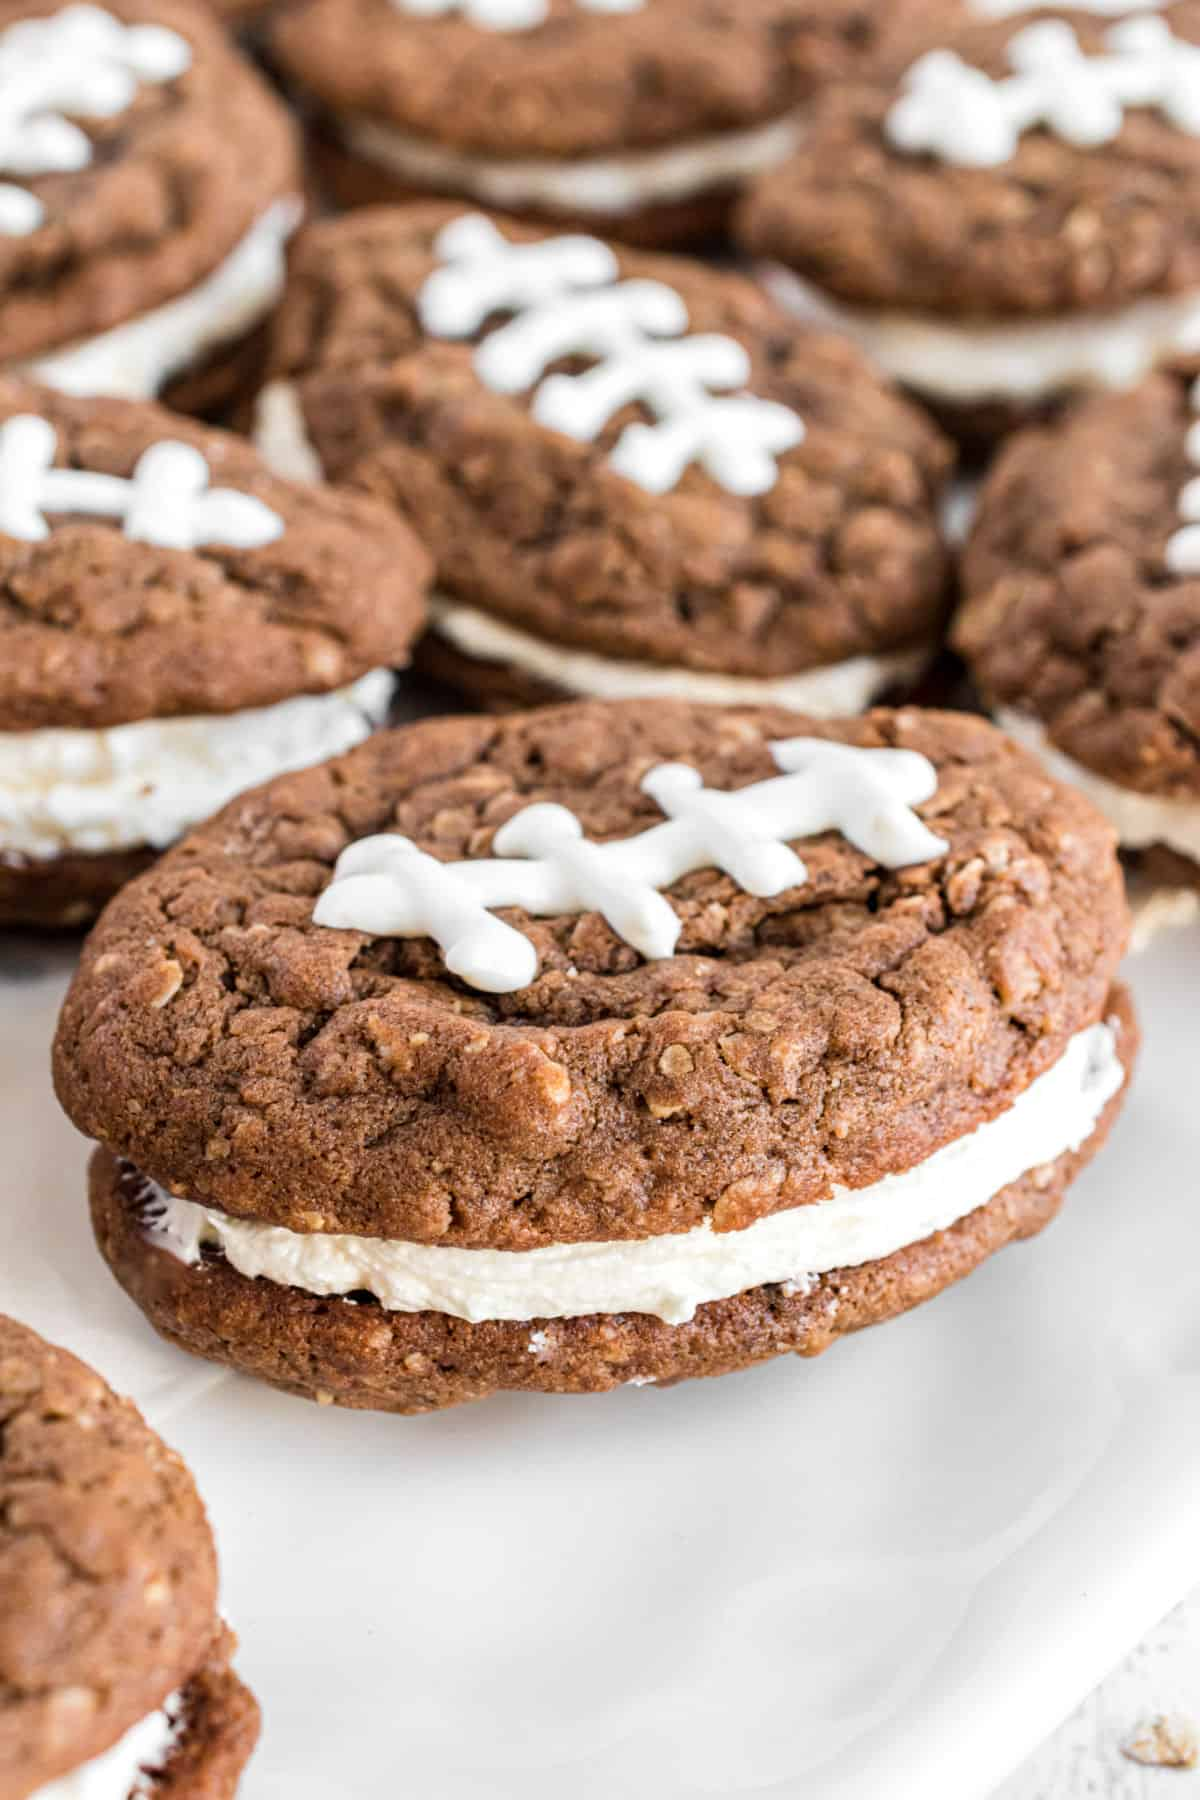 Football shaped oatmeal cream pies on white cake platter.